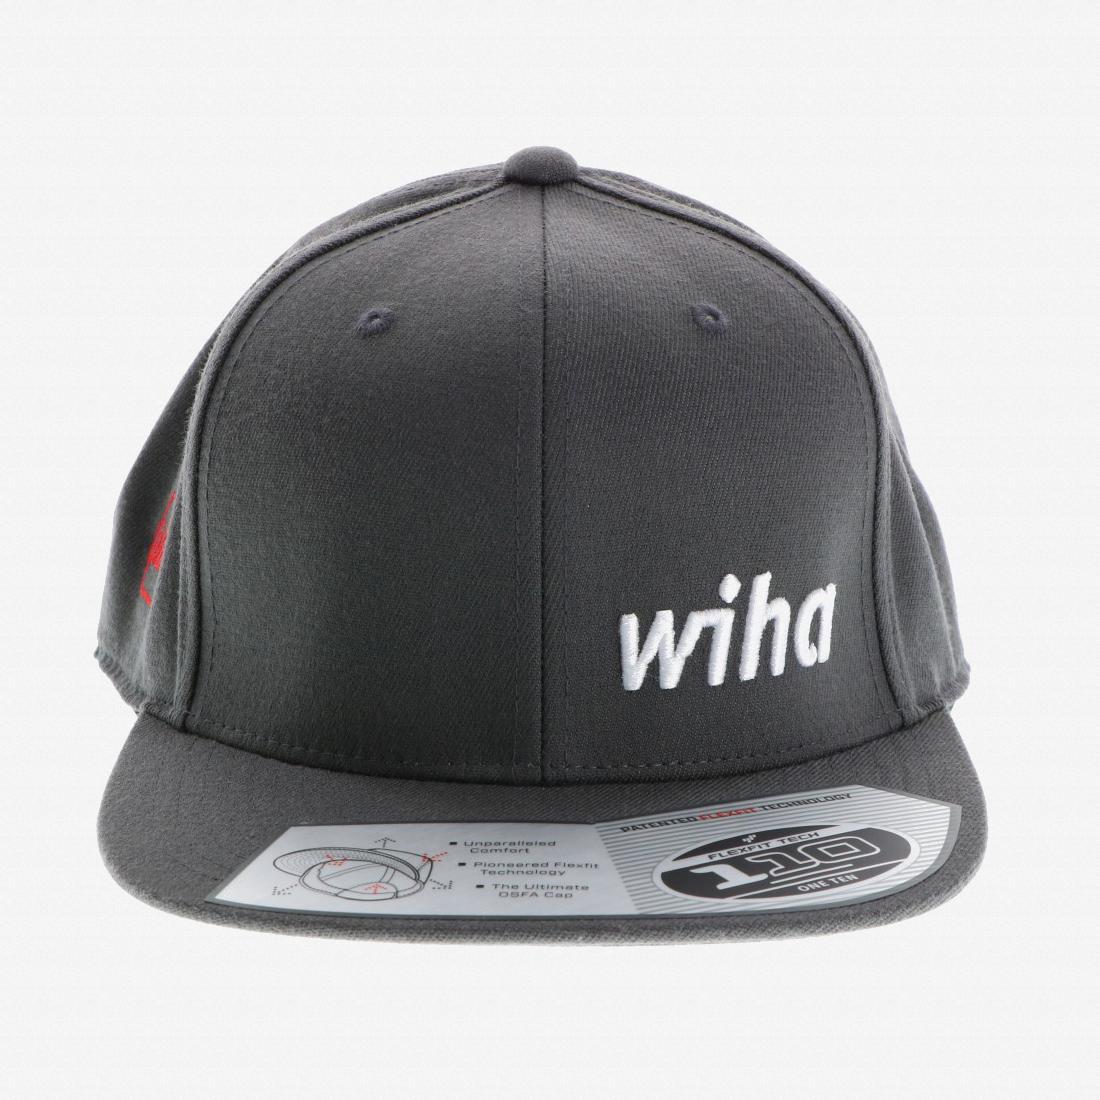 Wiha 91460 Premium FlexFit Hat - KC Tool